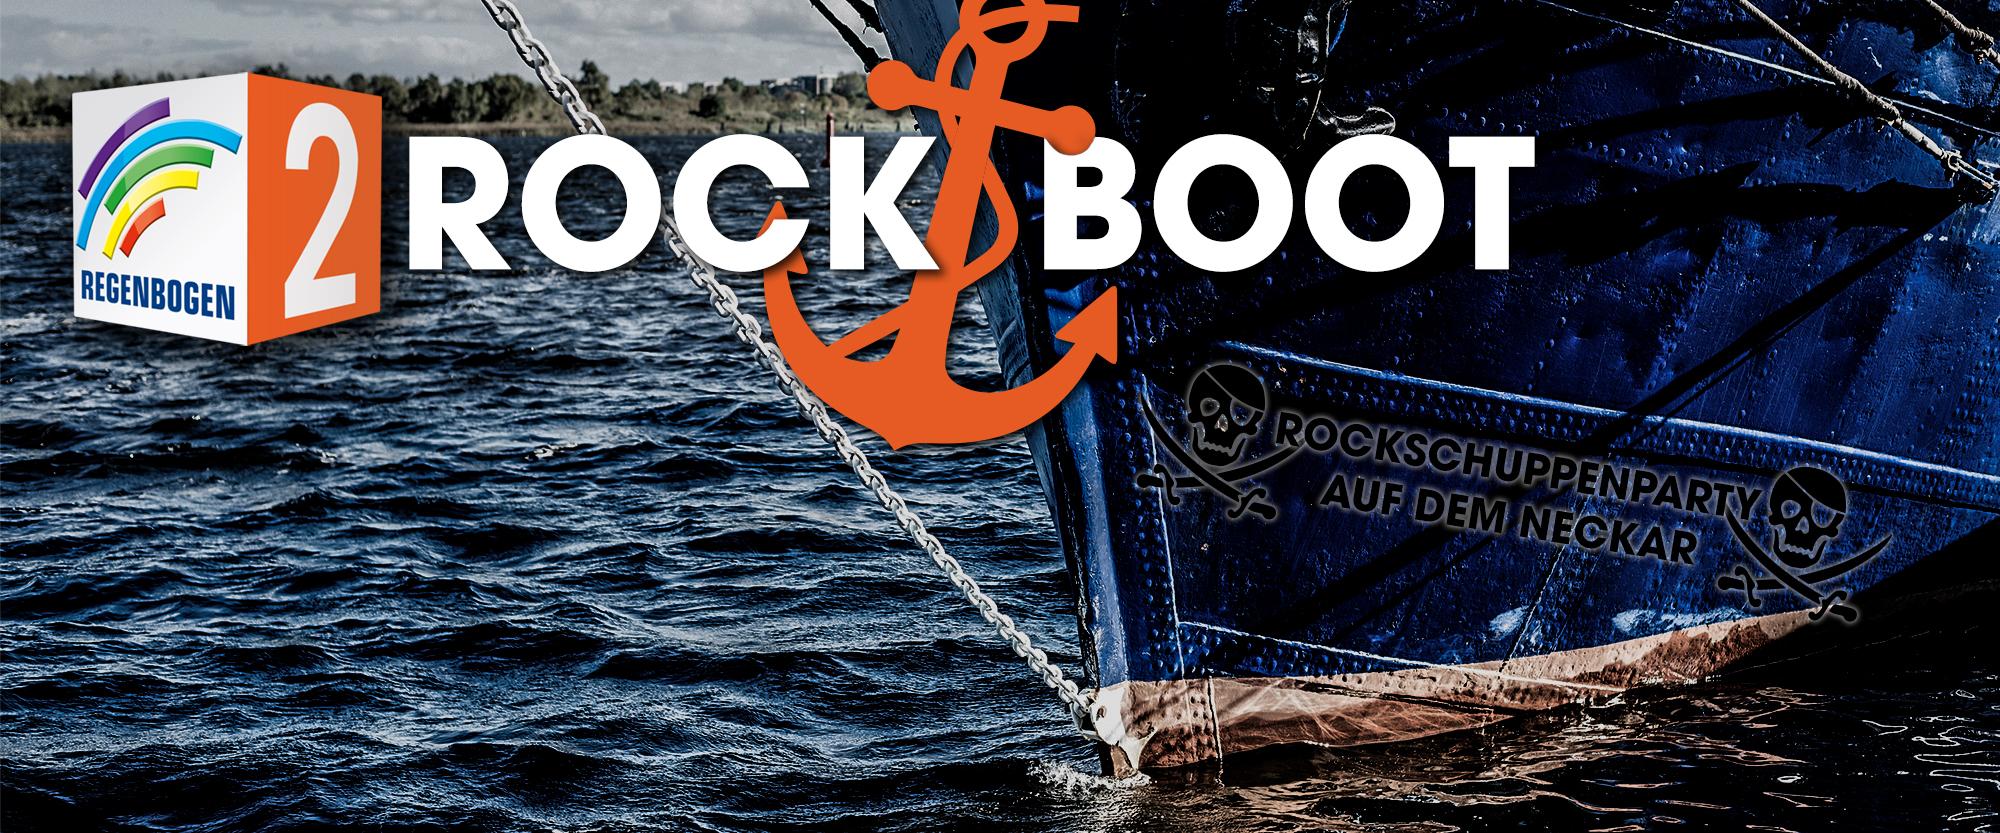 R2_Rockboot.jpg